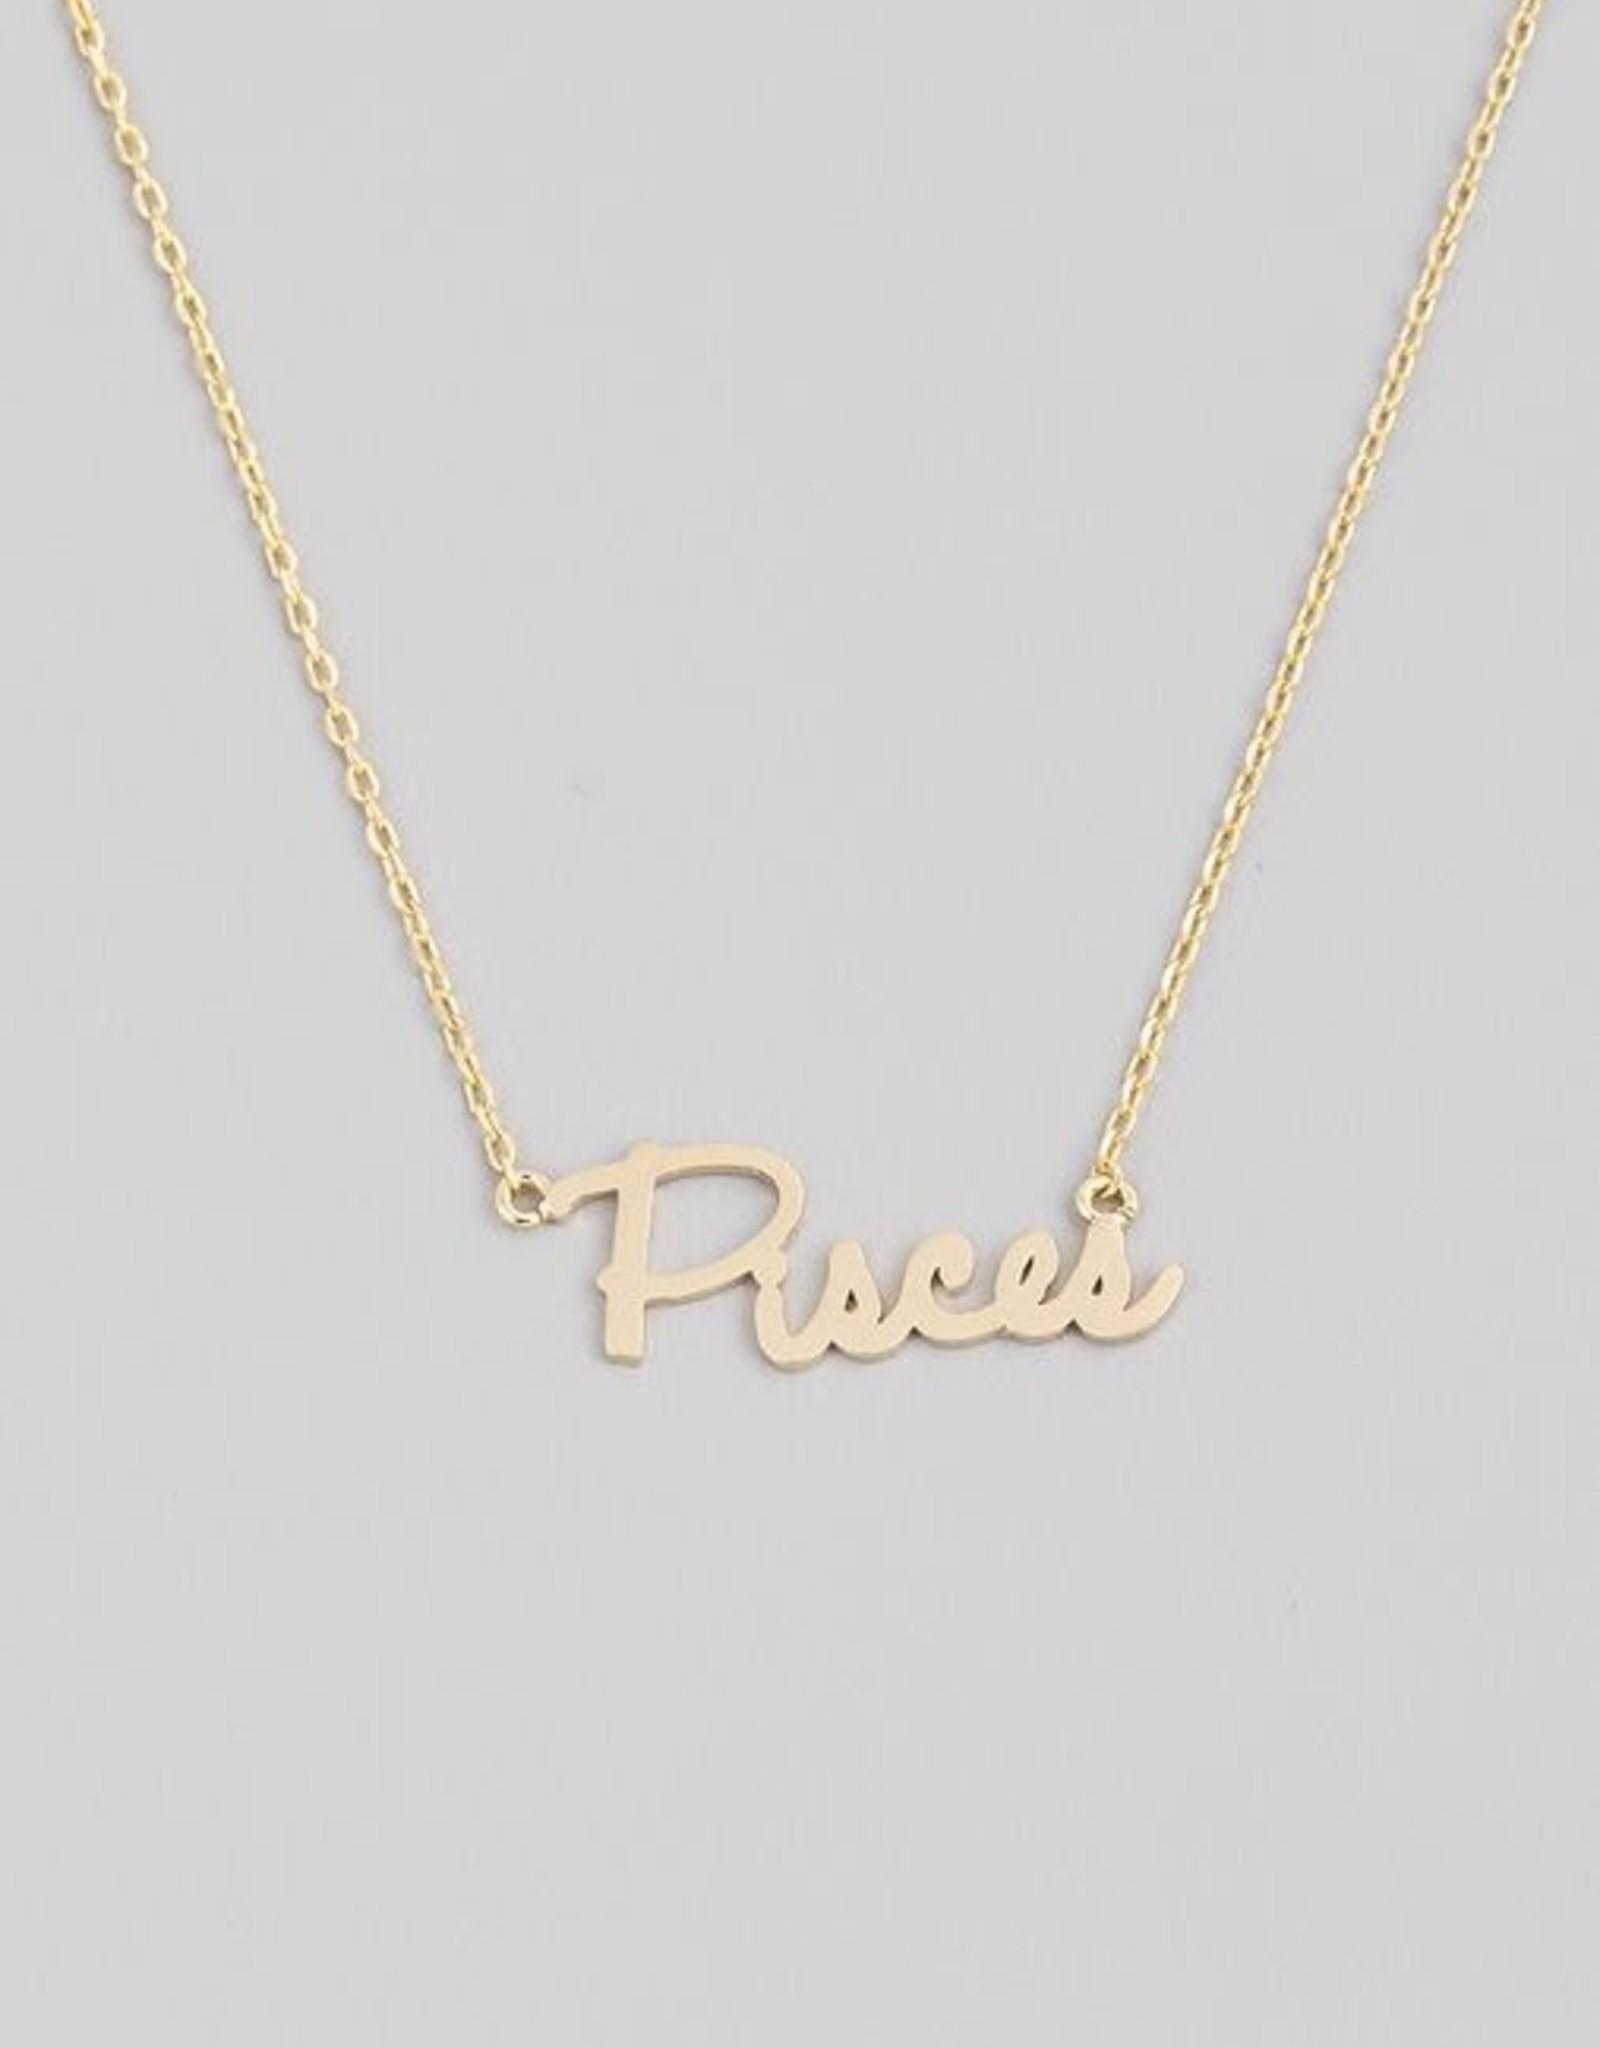 Fame Accessories Handwritten Zodiac Necklace - Pisces